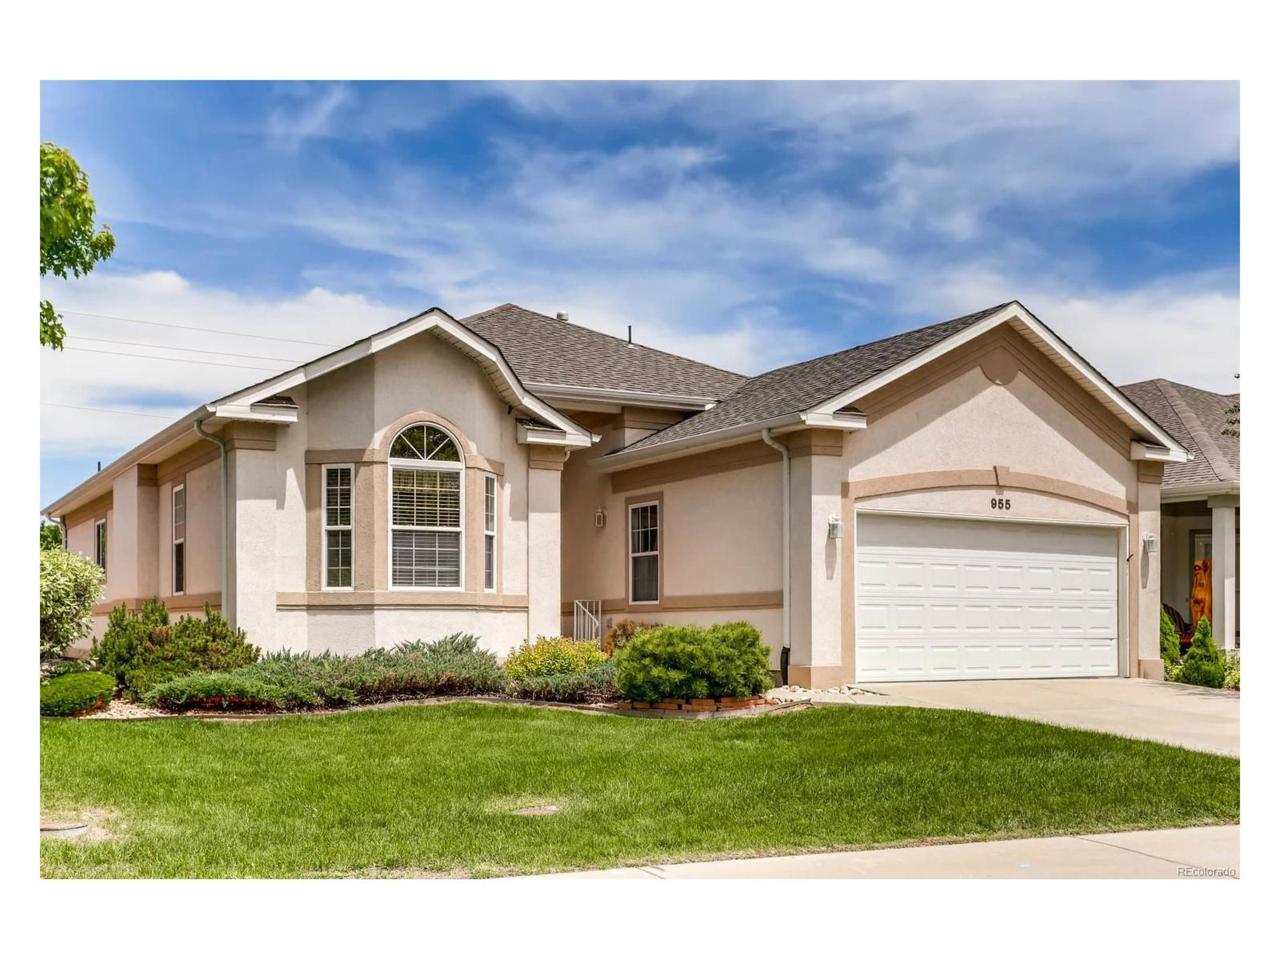 955 Champion Circle, Longmont, CO 80503 (MLS #8283312) :: 8z Real Estate